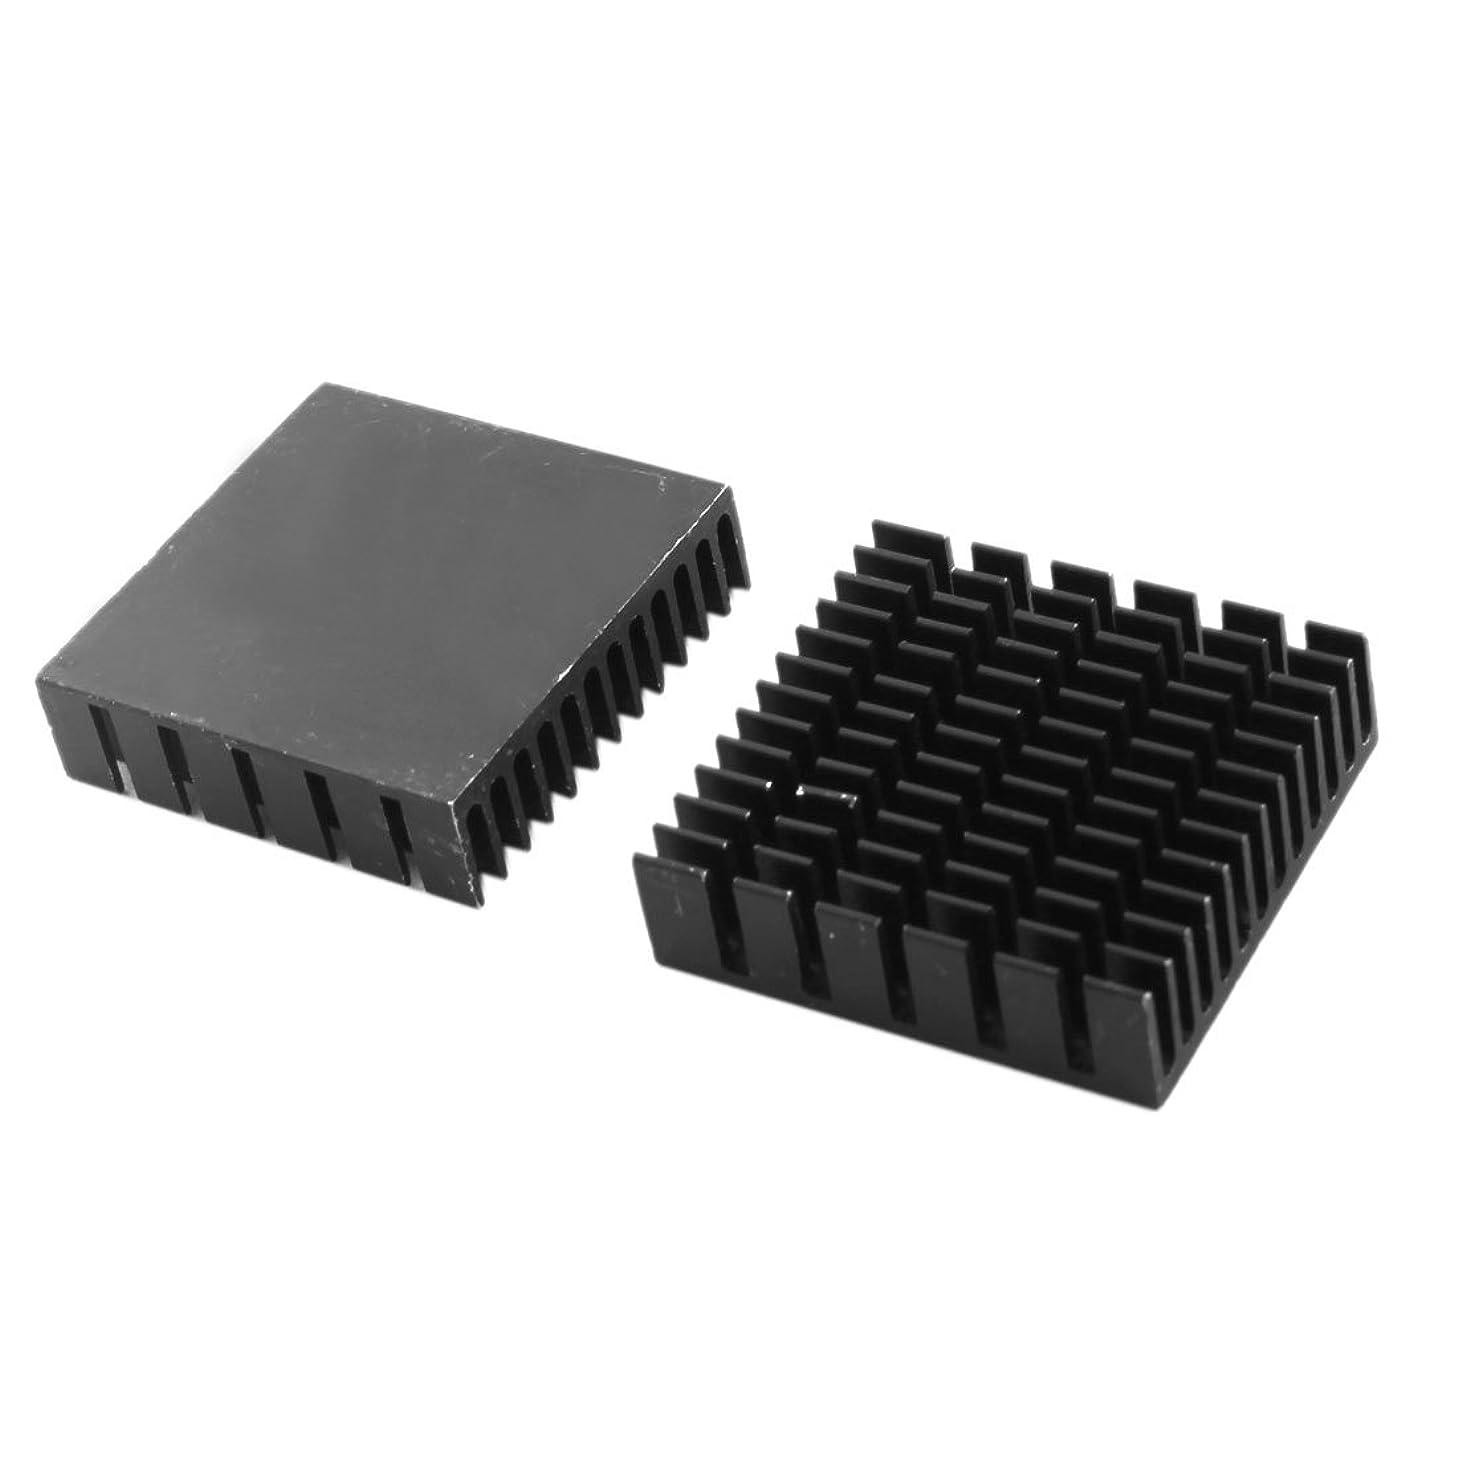 Aexit PCB Board Relays 40x11x40mm Black Aluminum Chipset Heatsink Cooling PC Board Relays Fin 2PCS